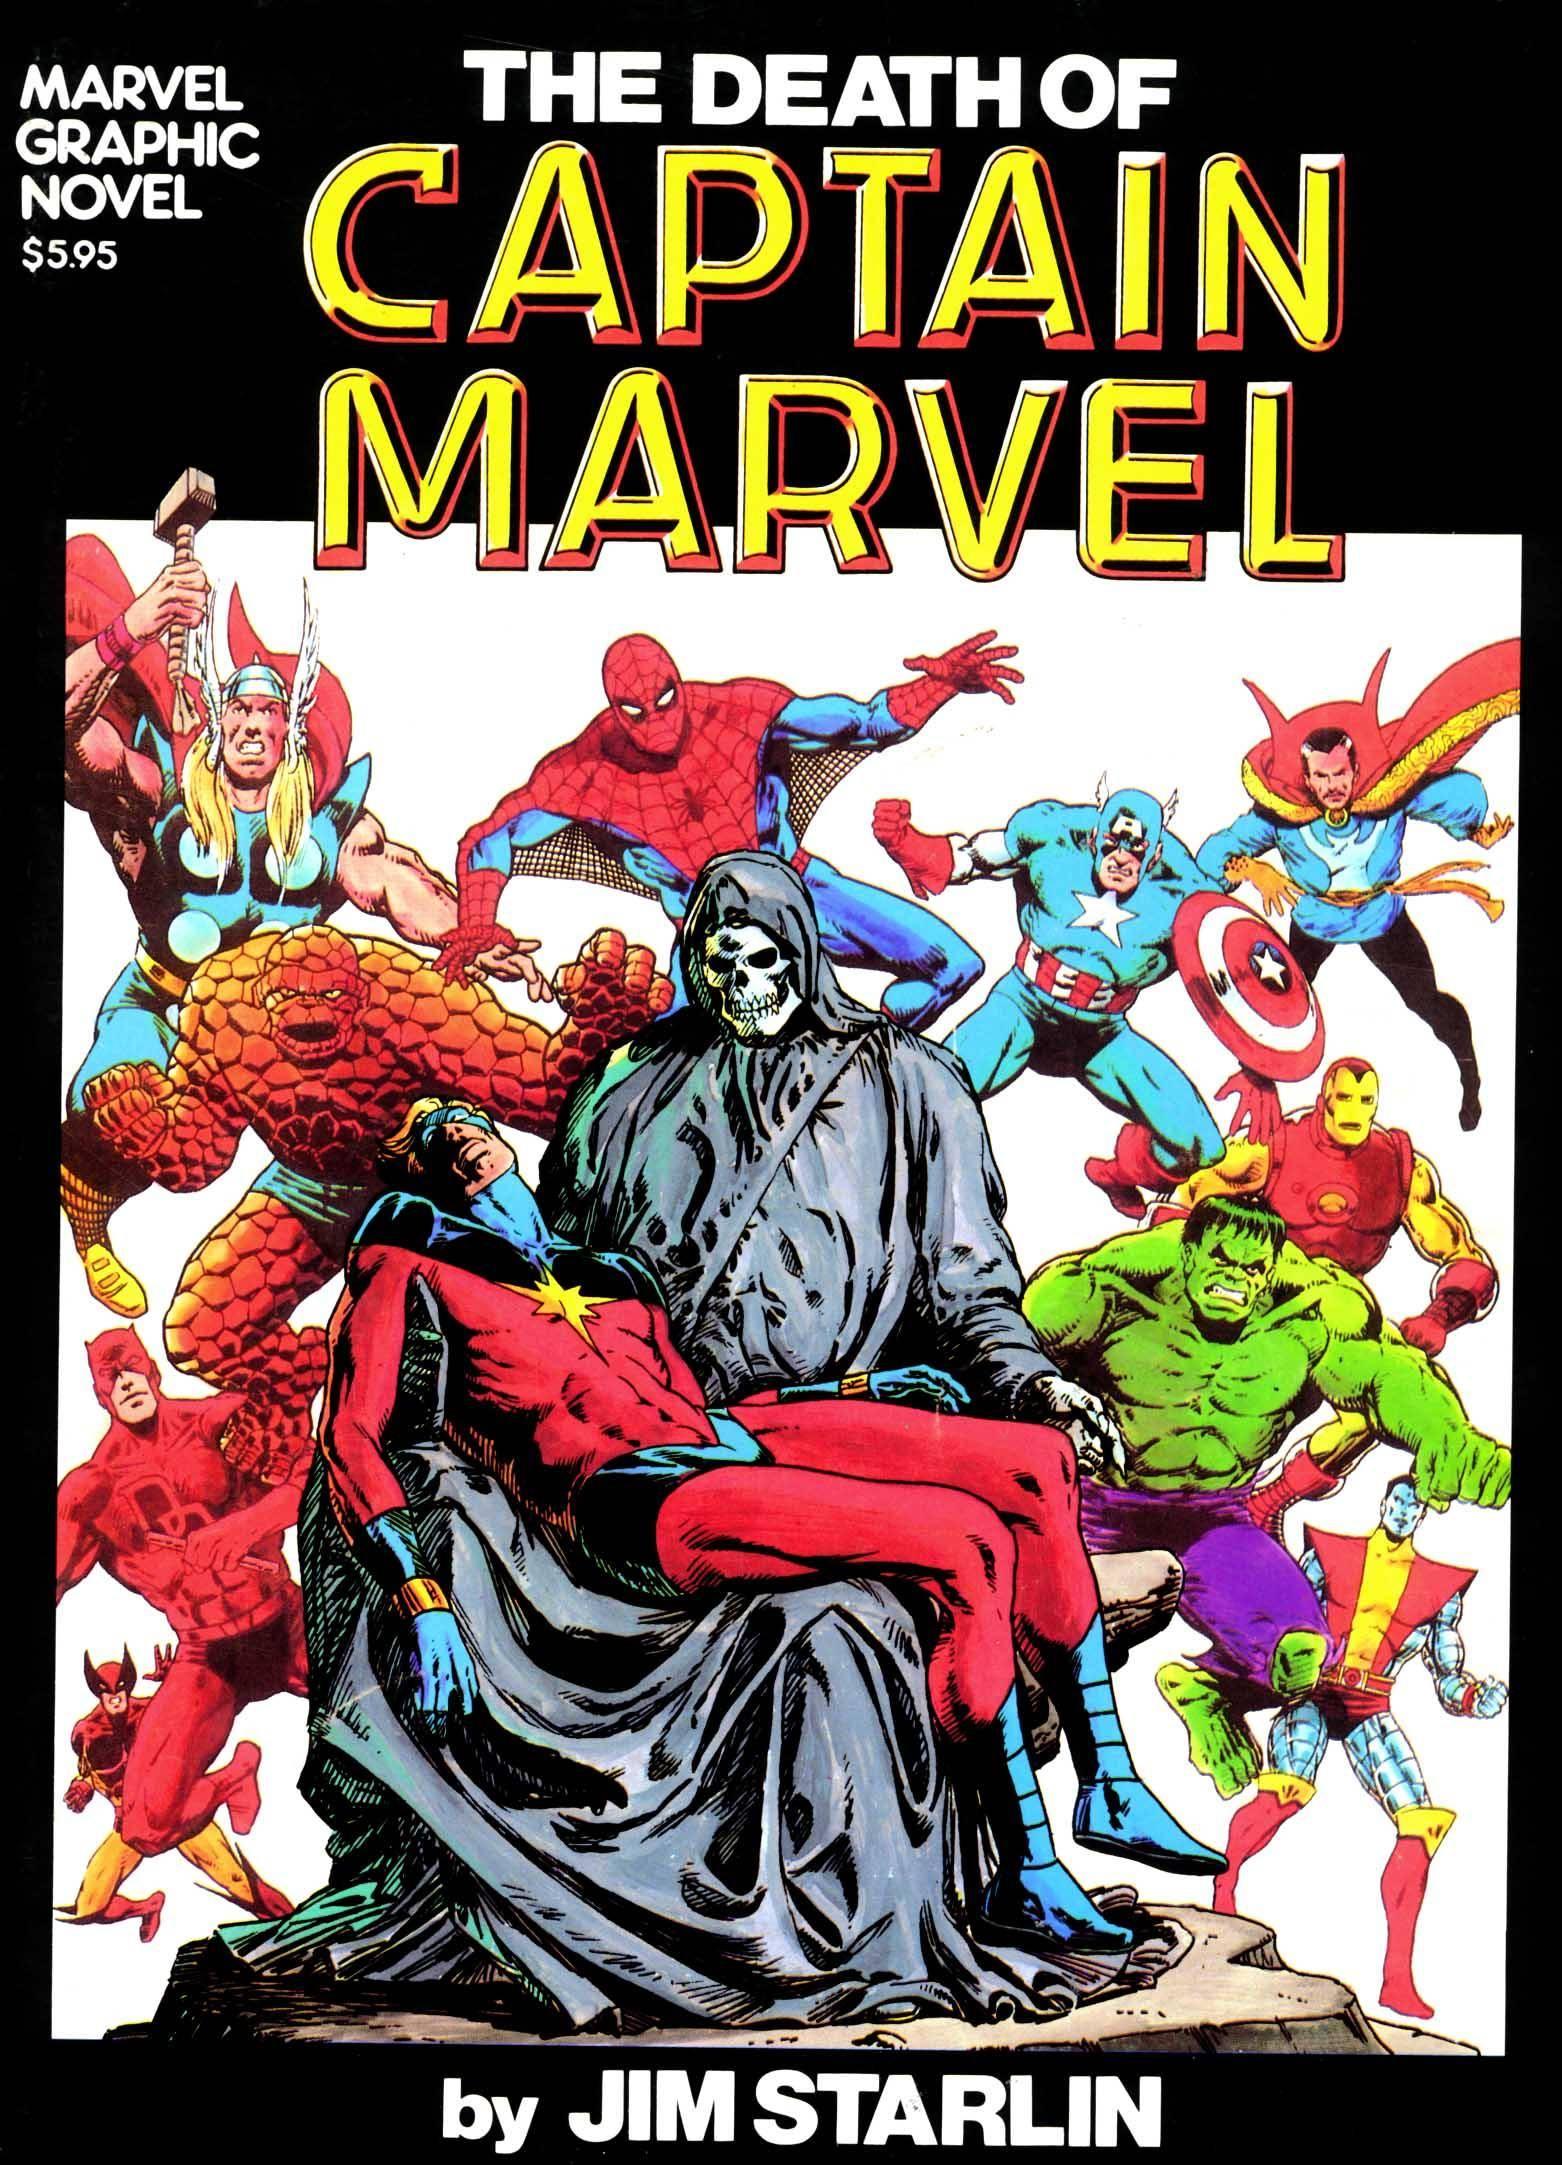 Marvel Graphic Novel 01 - The Death of Captain Marvel 1982